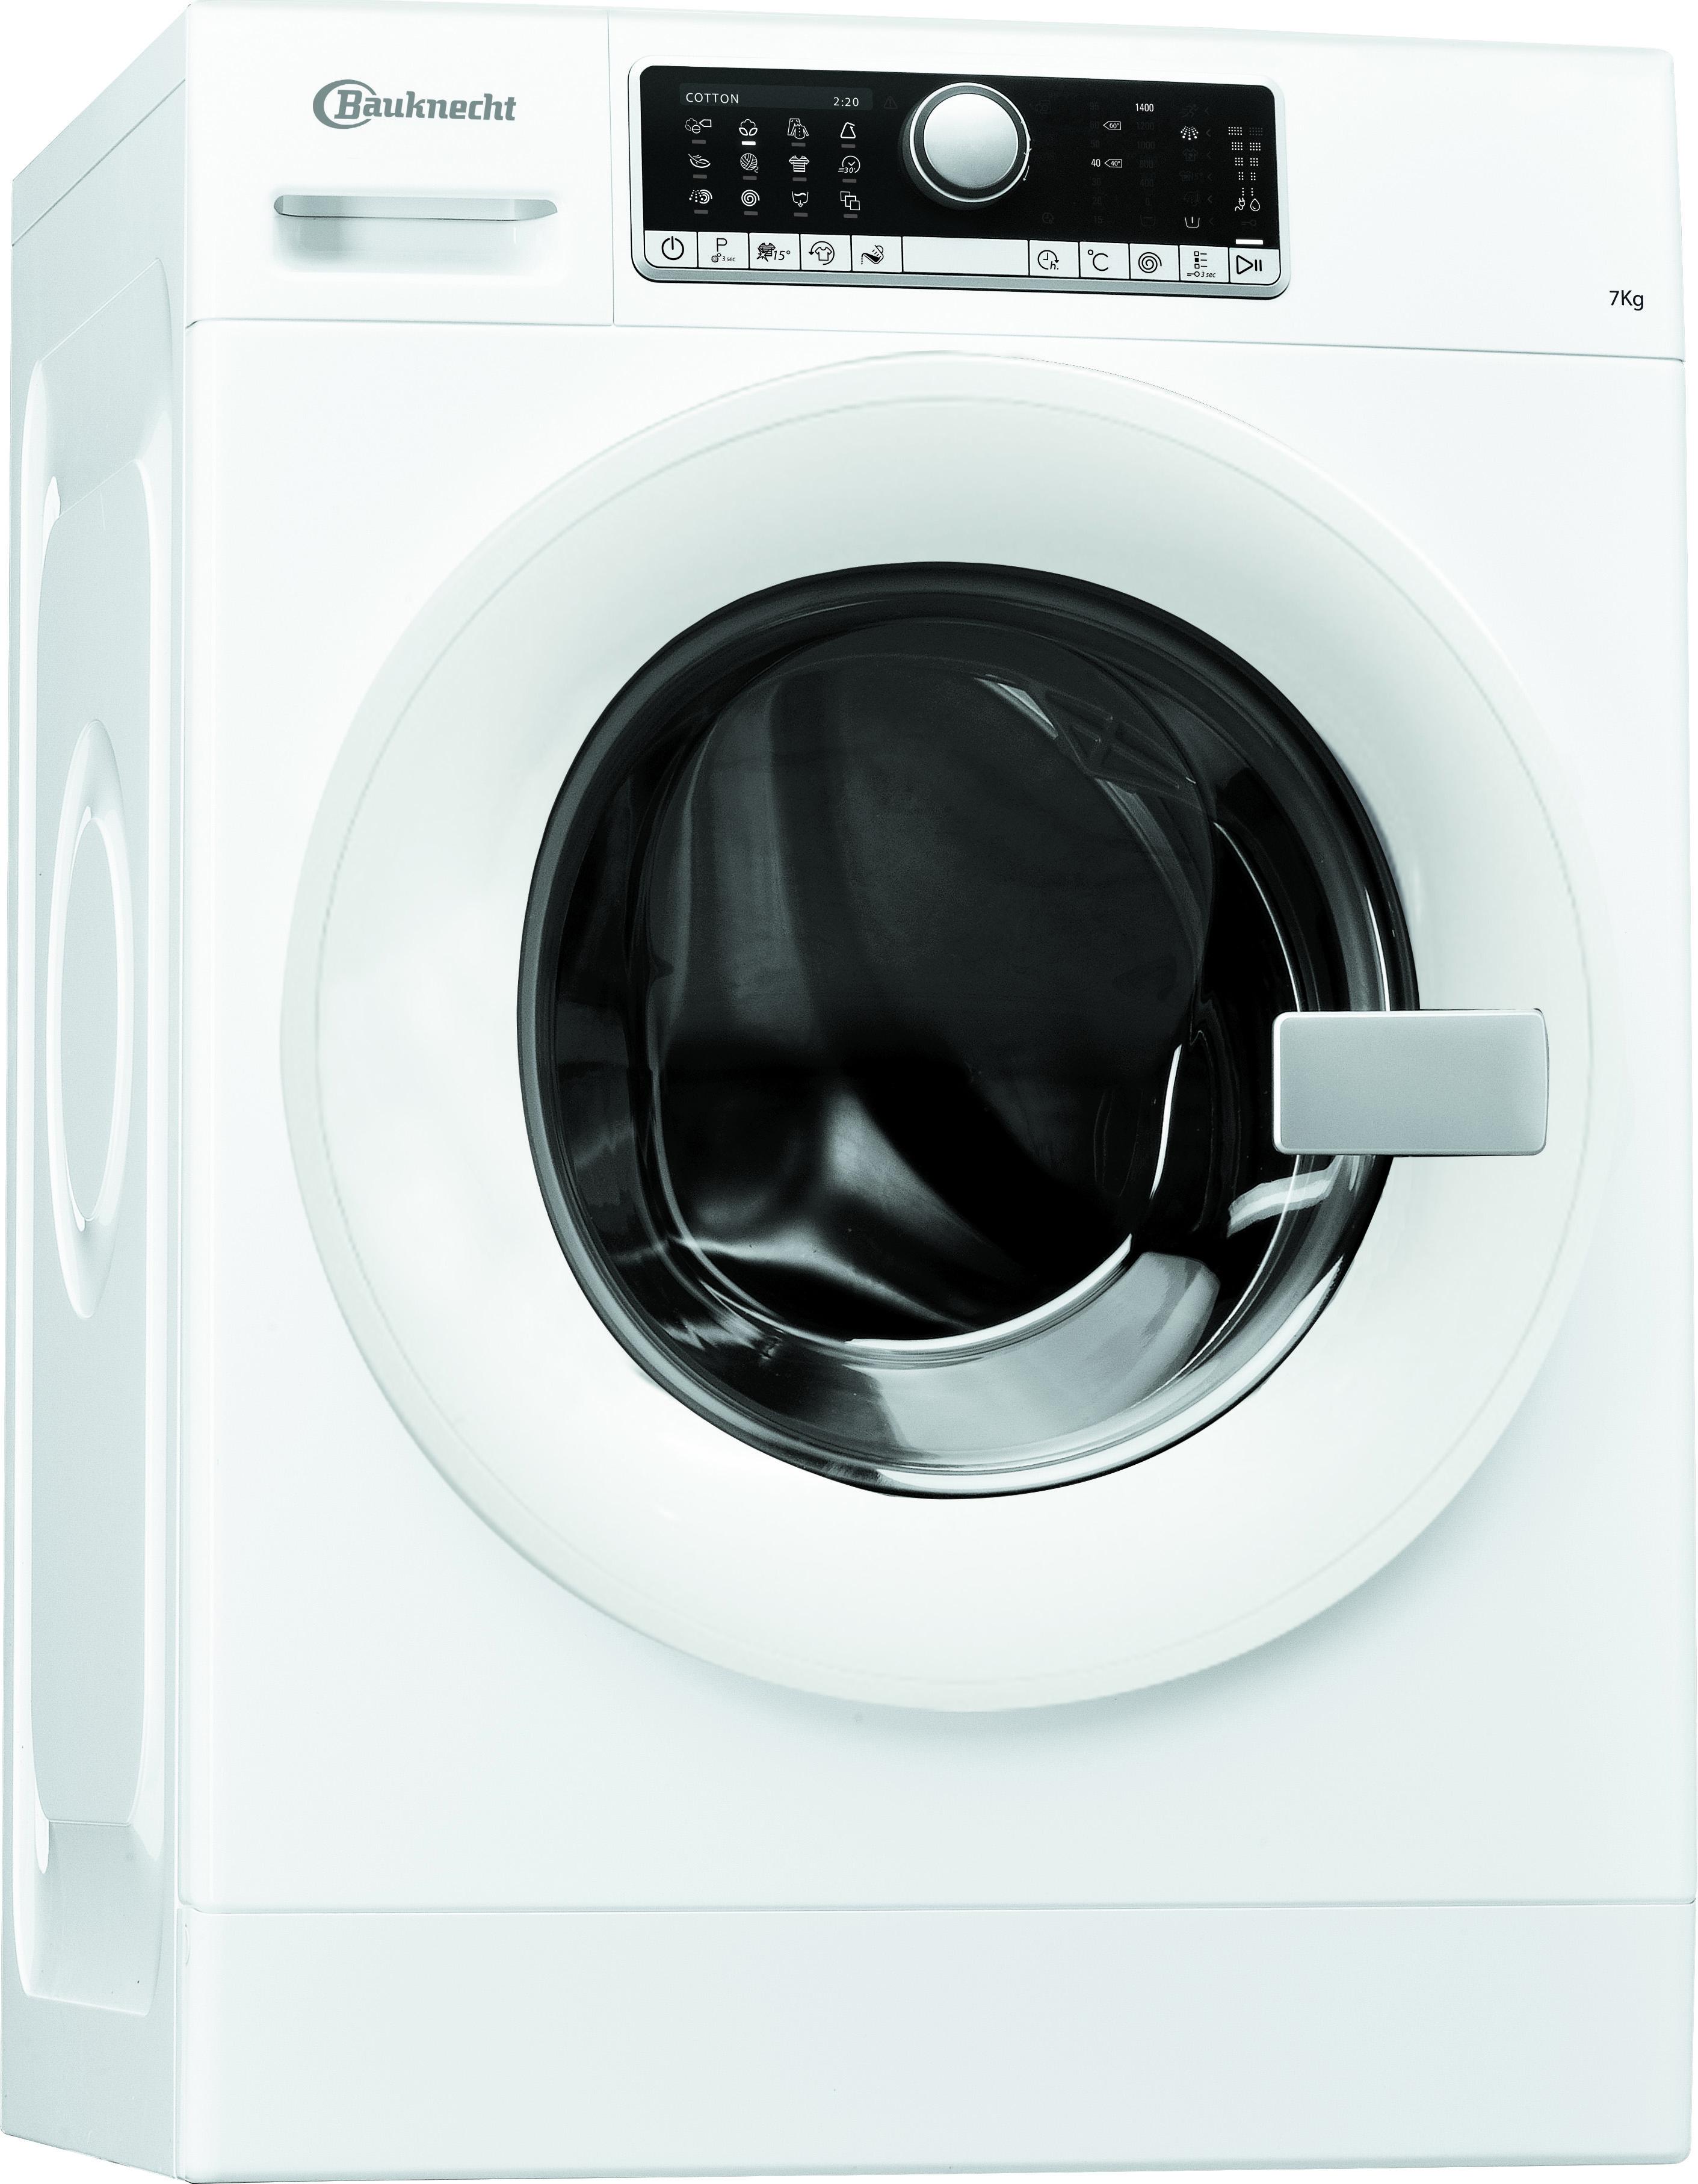 bauknecht wapc 74540 weiss waschmaschine waschmaschinen waschen trocknen haushalt. Black Bedroom Furniture Sets. Home Design Ideas